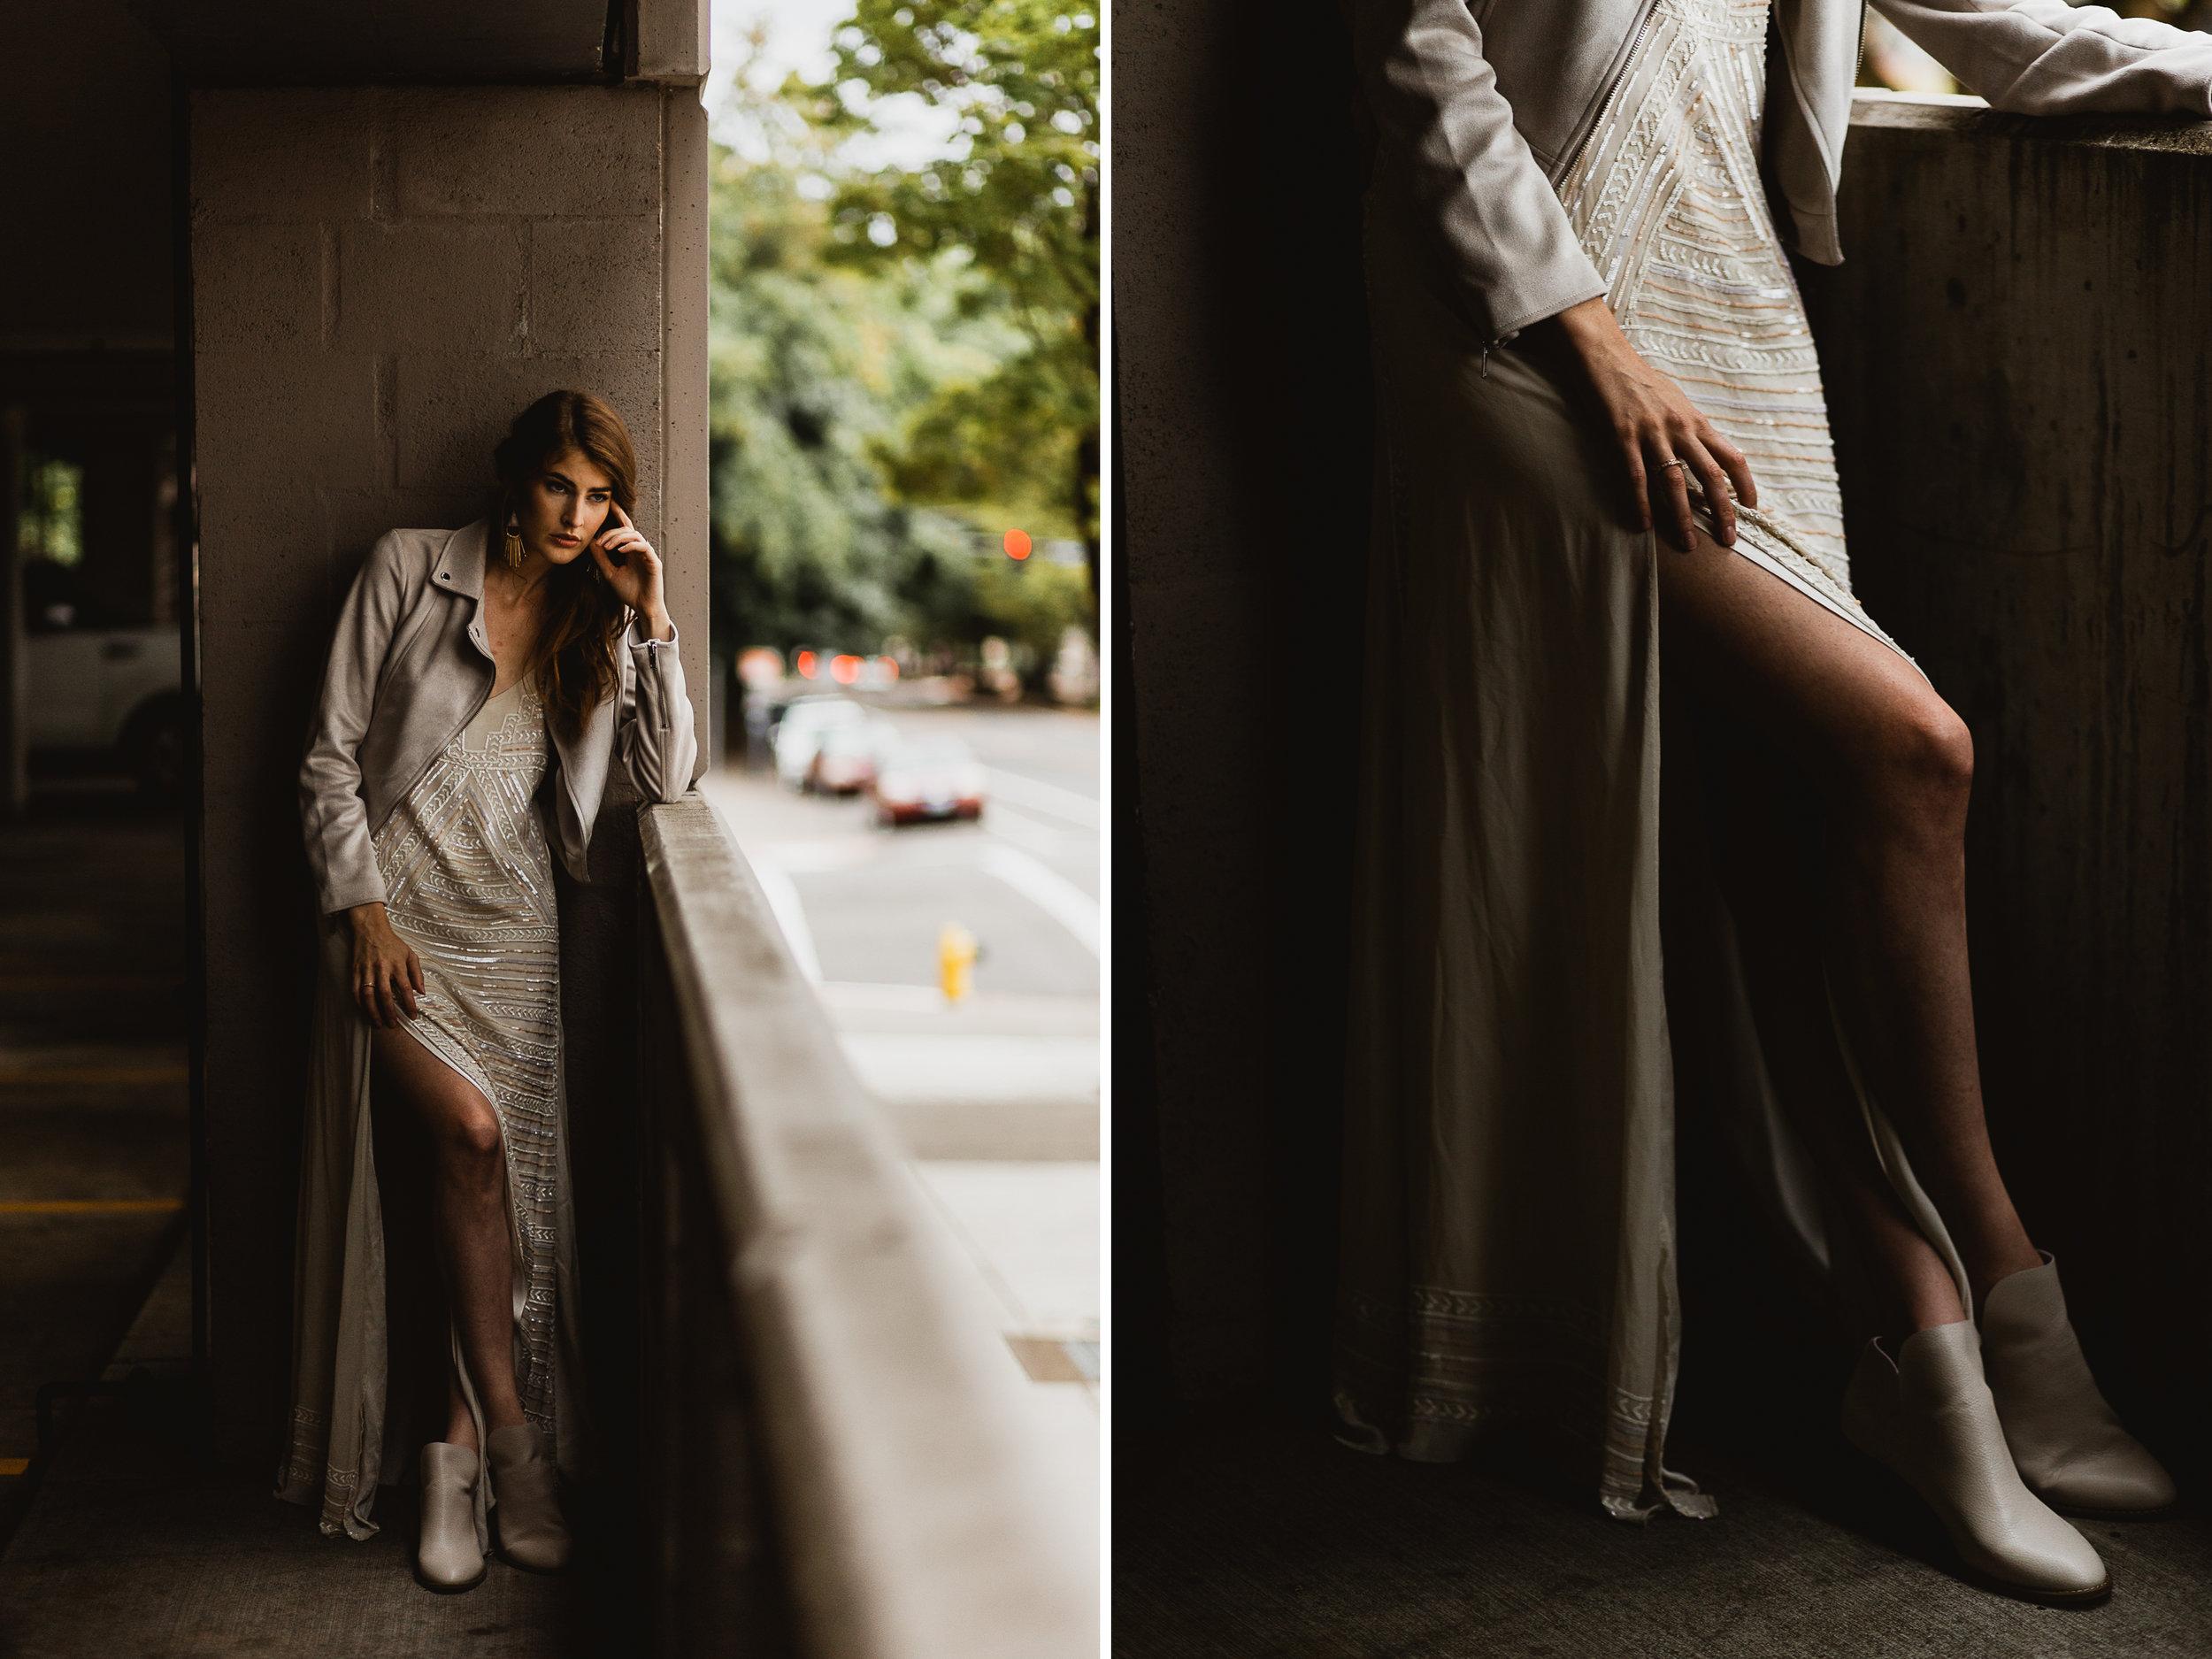 Amy - Bridal Styled Shoot - Vancouver WA - Malina Rose Photography-D7.jpg